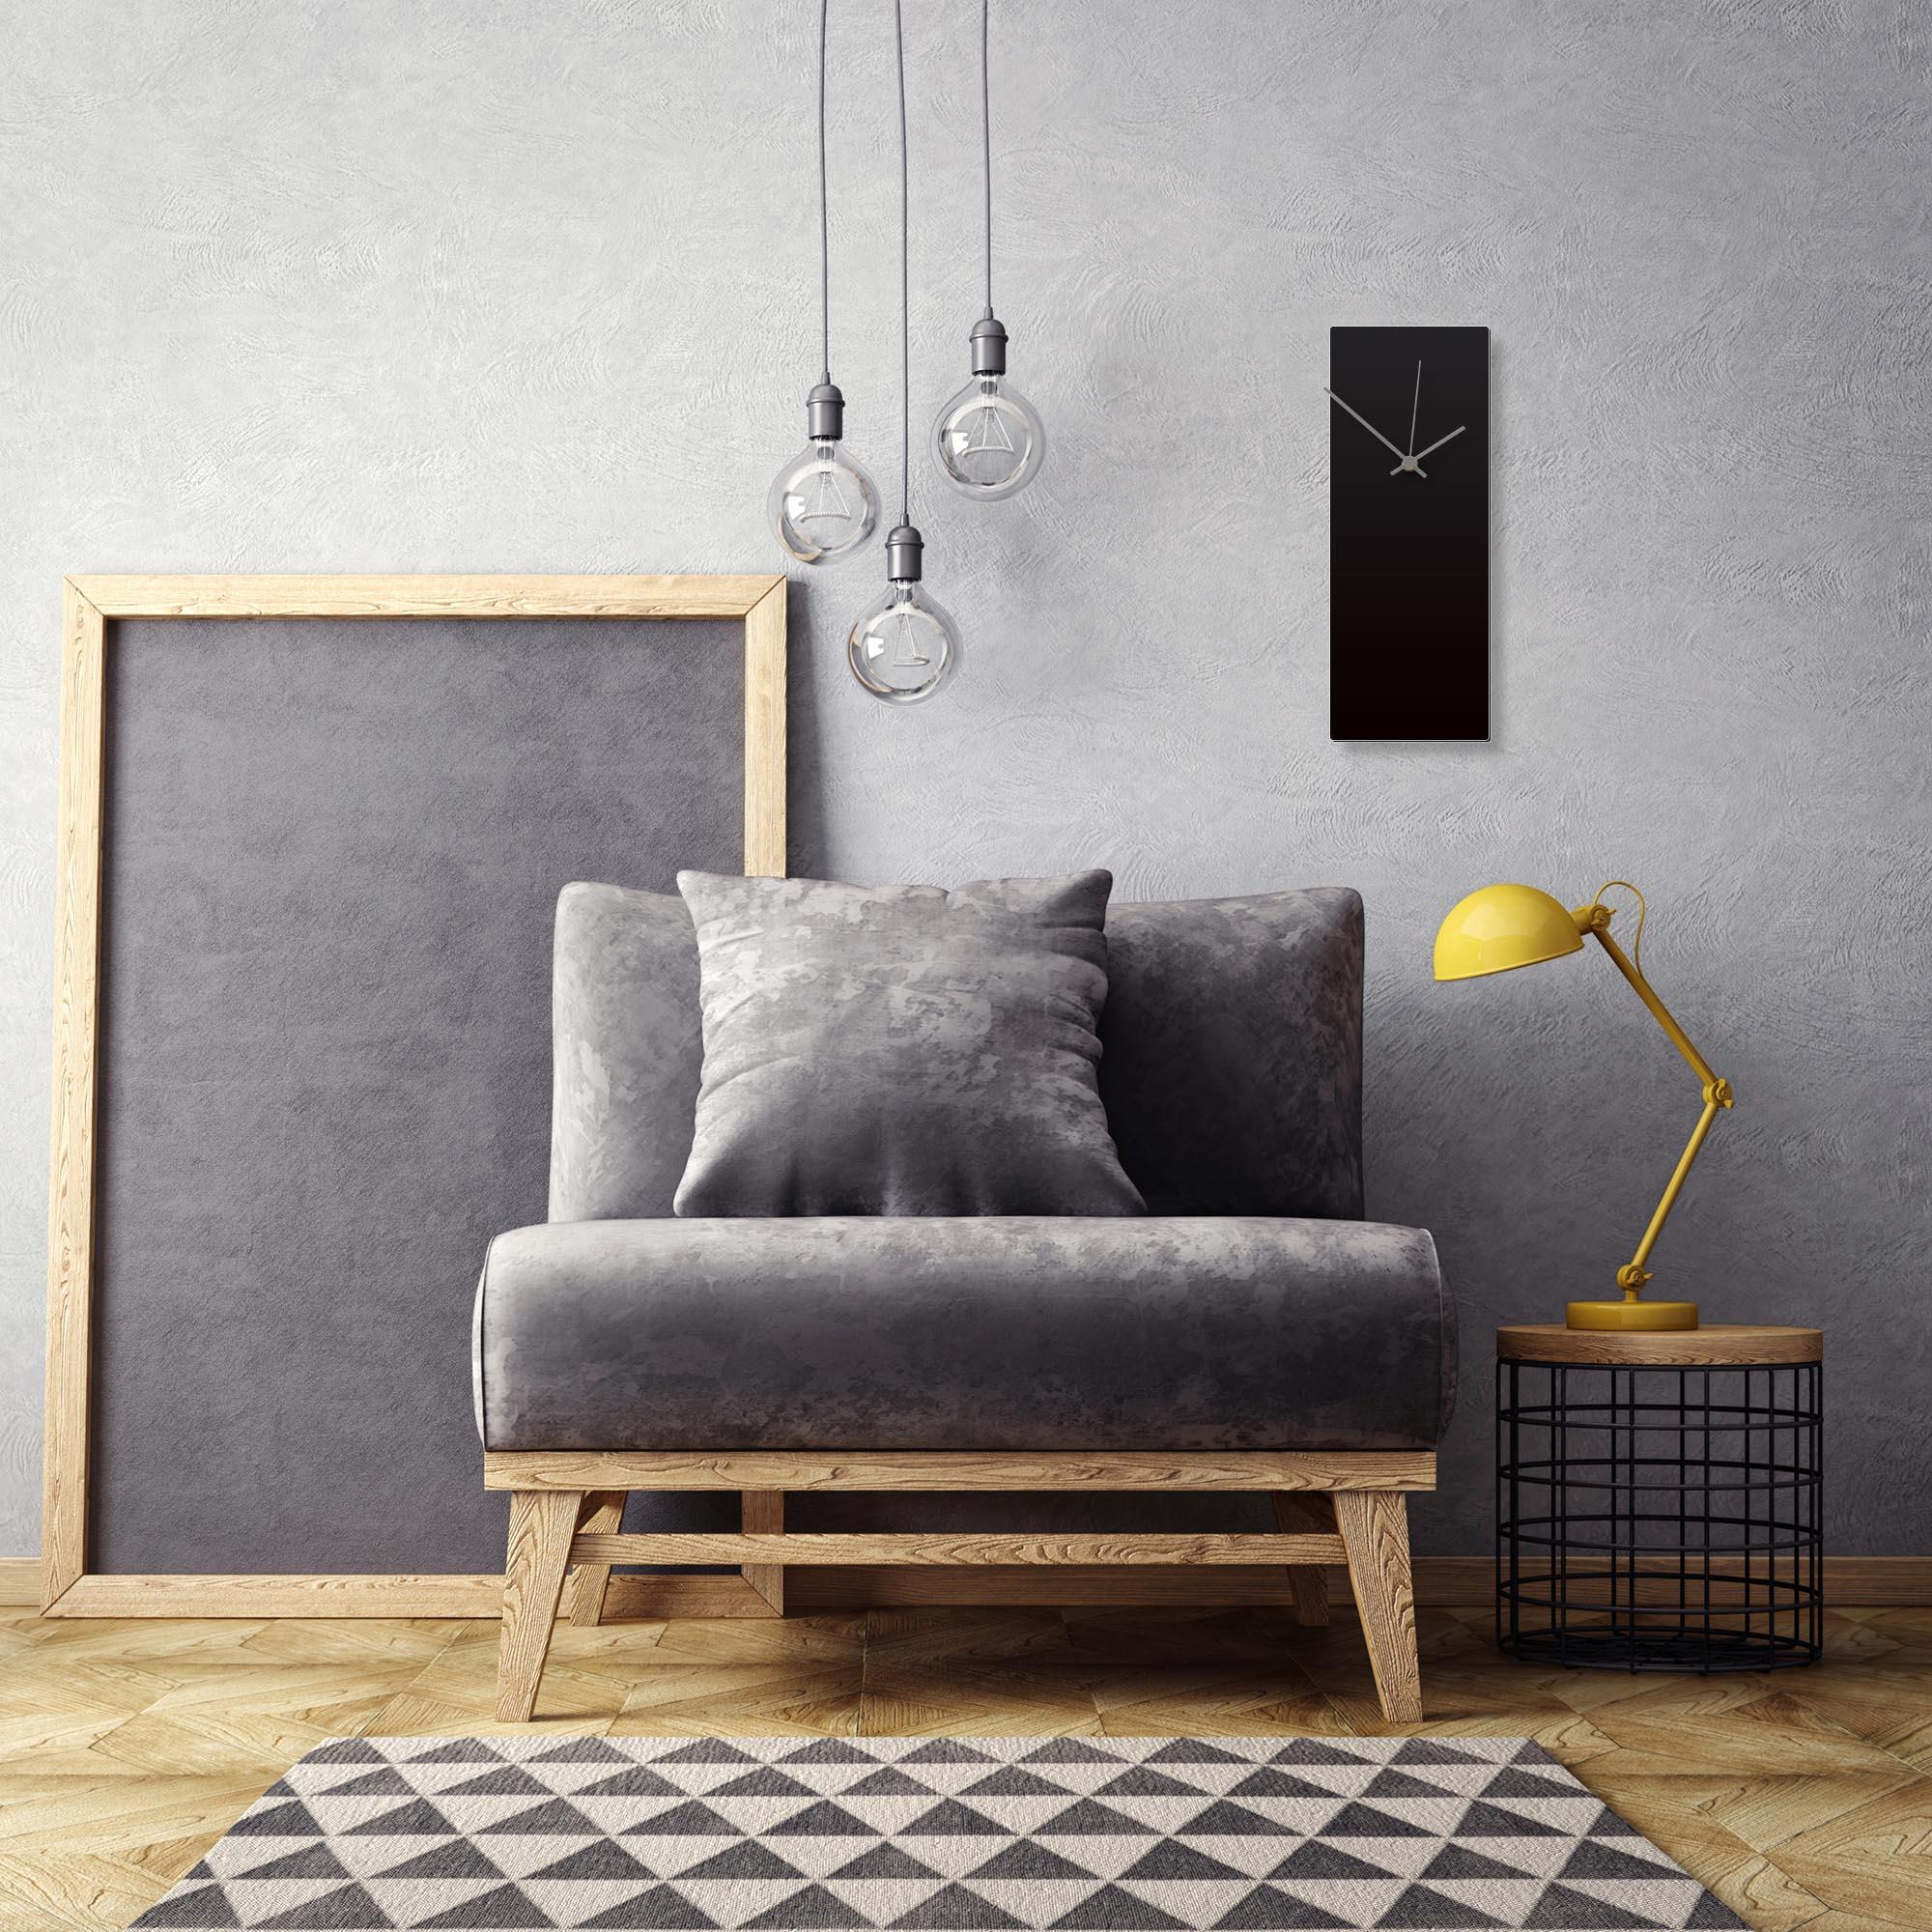 Blackout Grey Clock by Adam Schwoeppe Contemporary Clock on Aluminum Polymetal - Alternate View 1